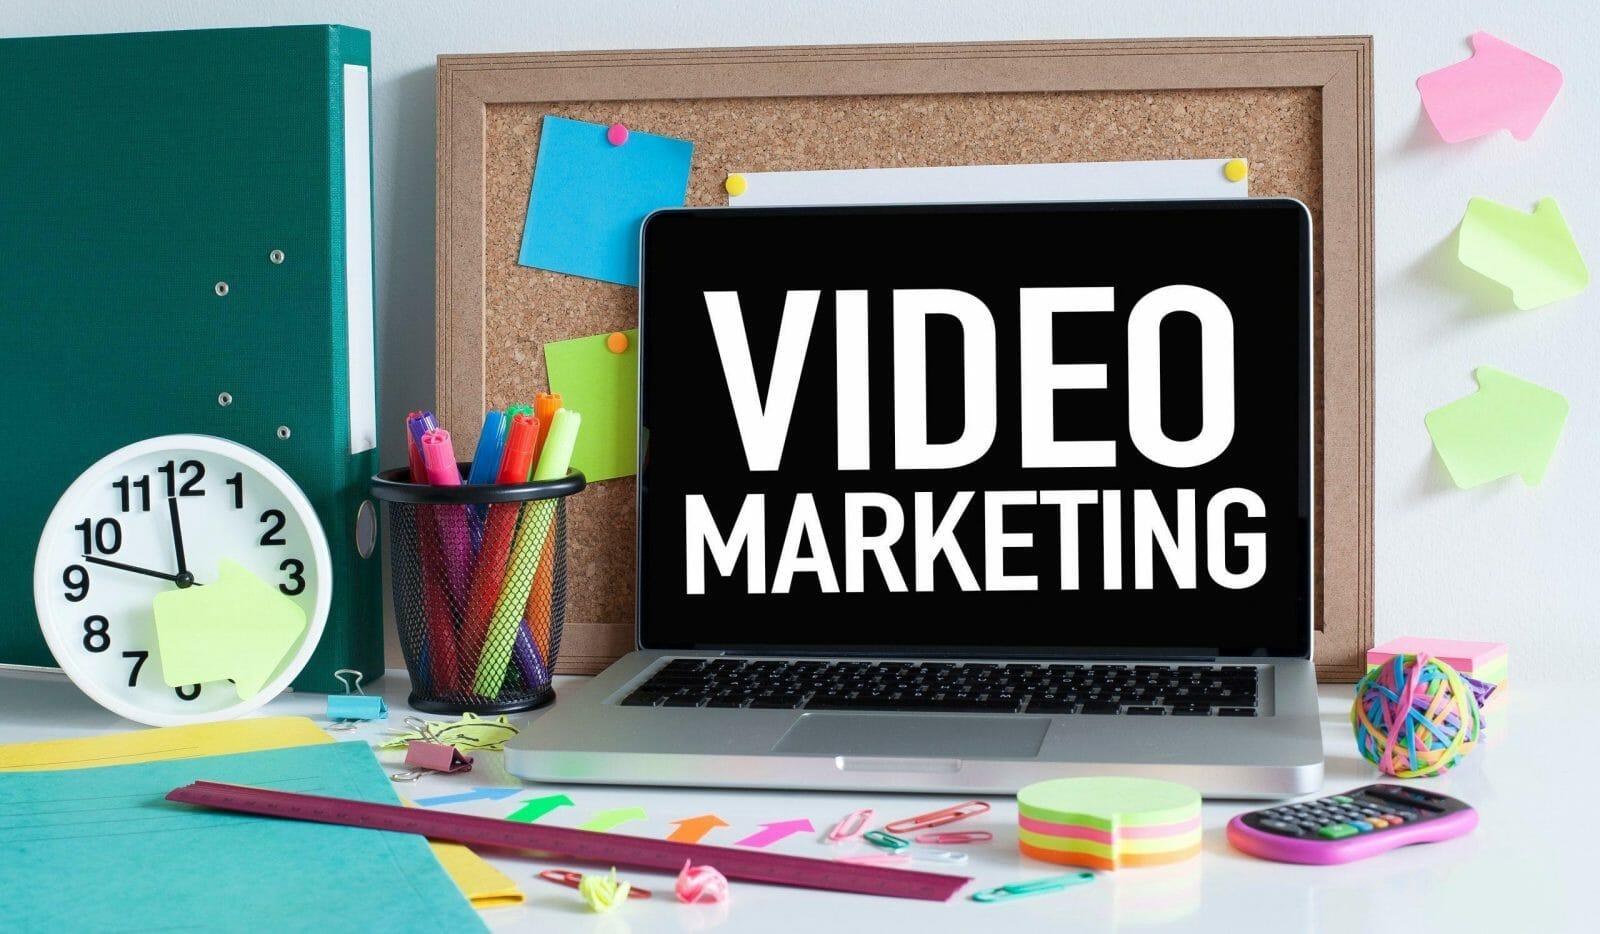 Video, marketing, business, strategy, internet